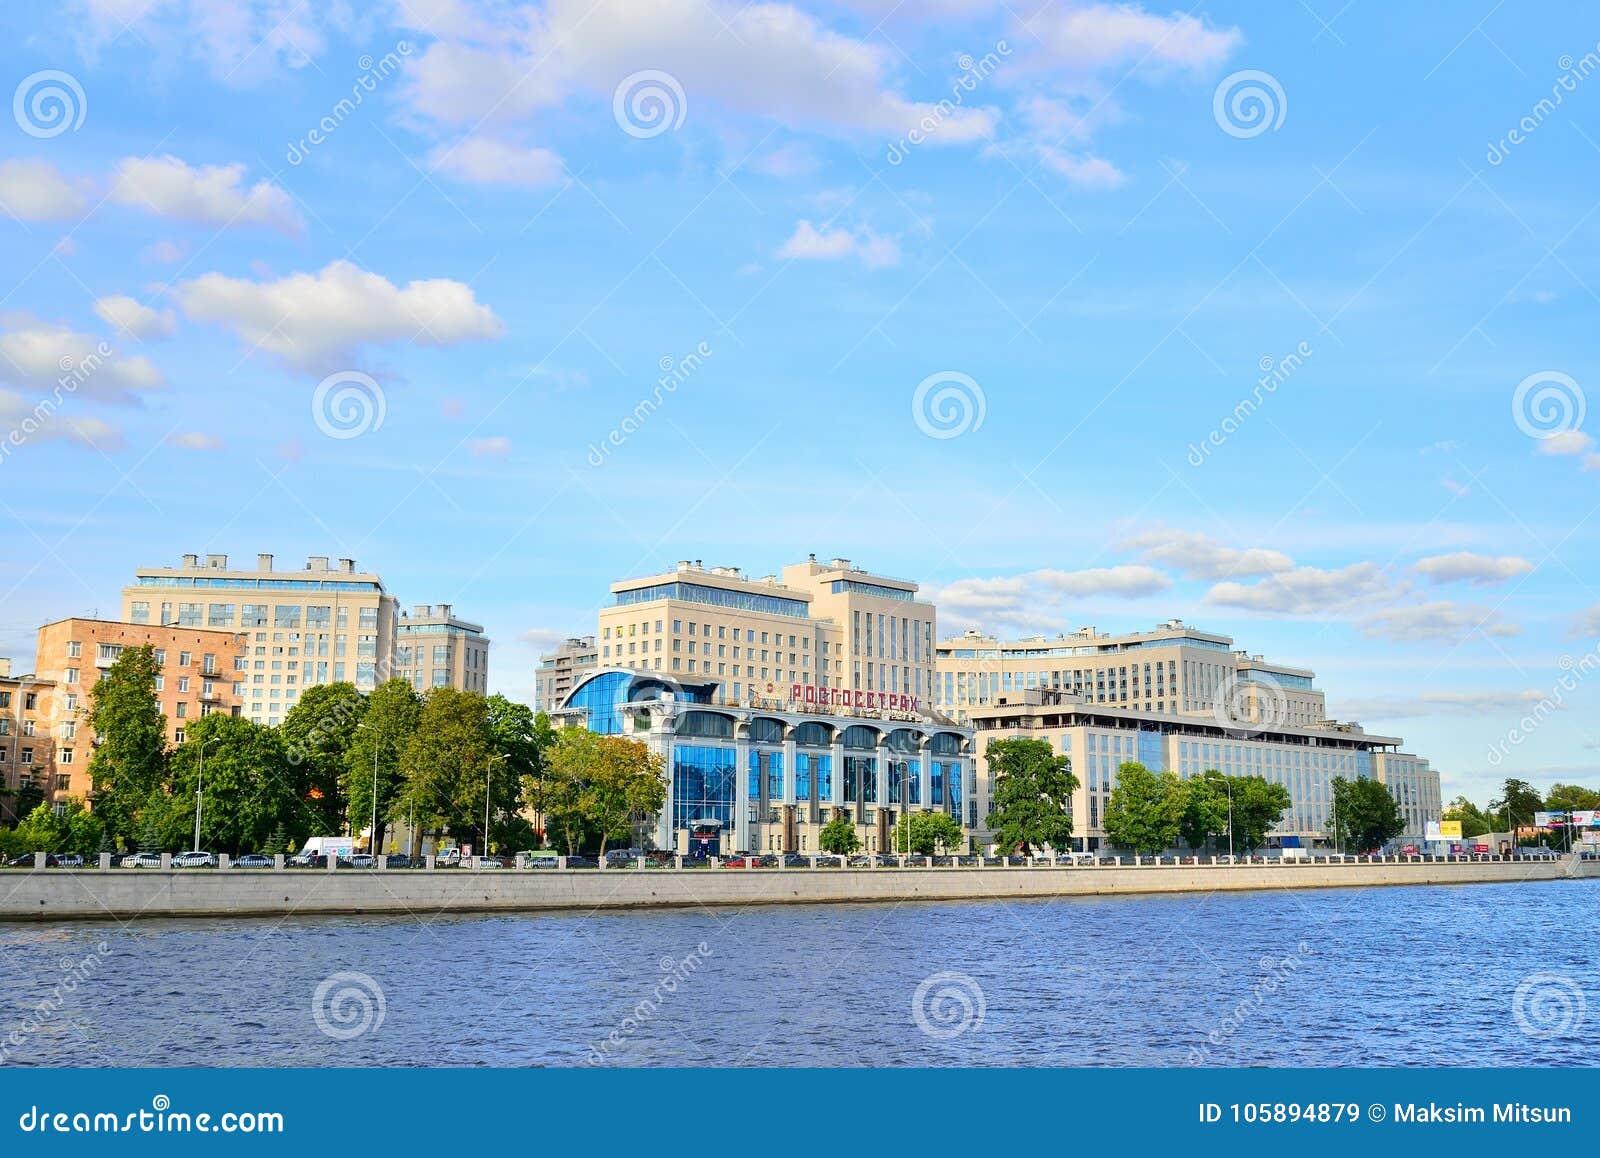 The Office Of The Insurance Company Rosgosstrakh On The